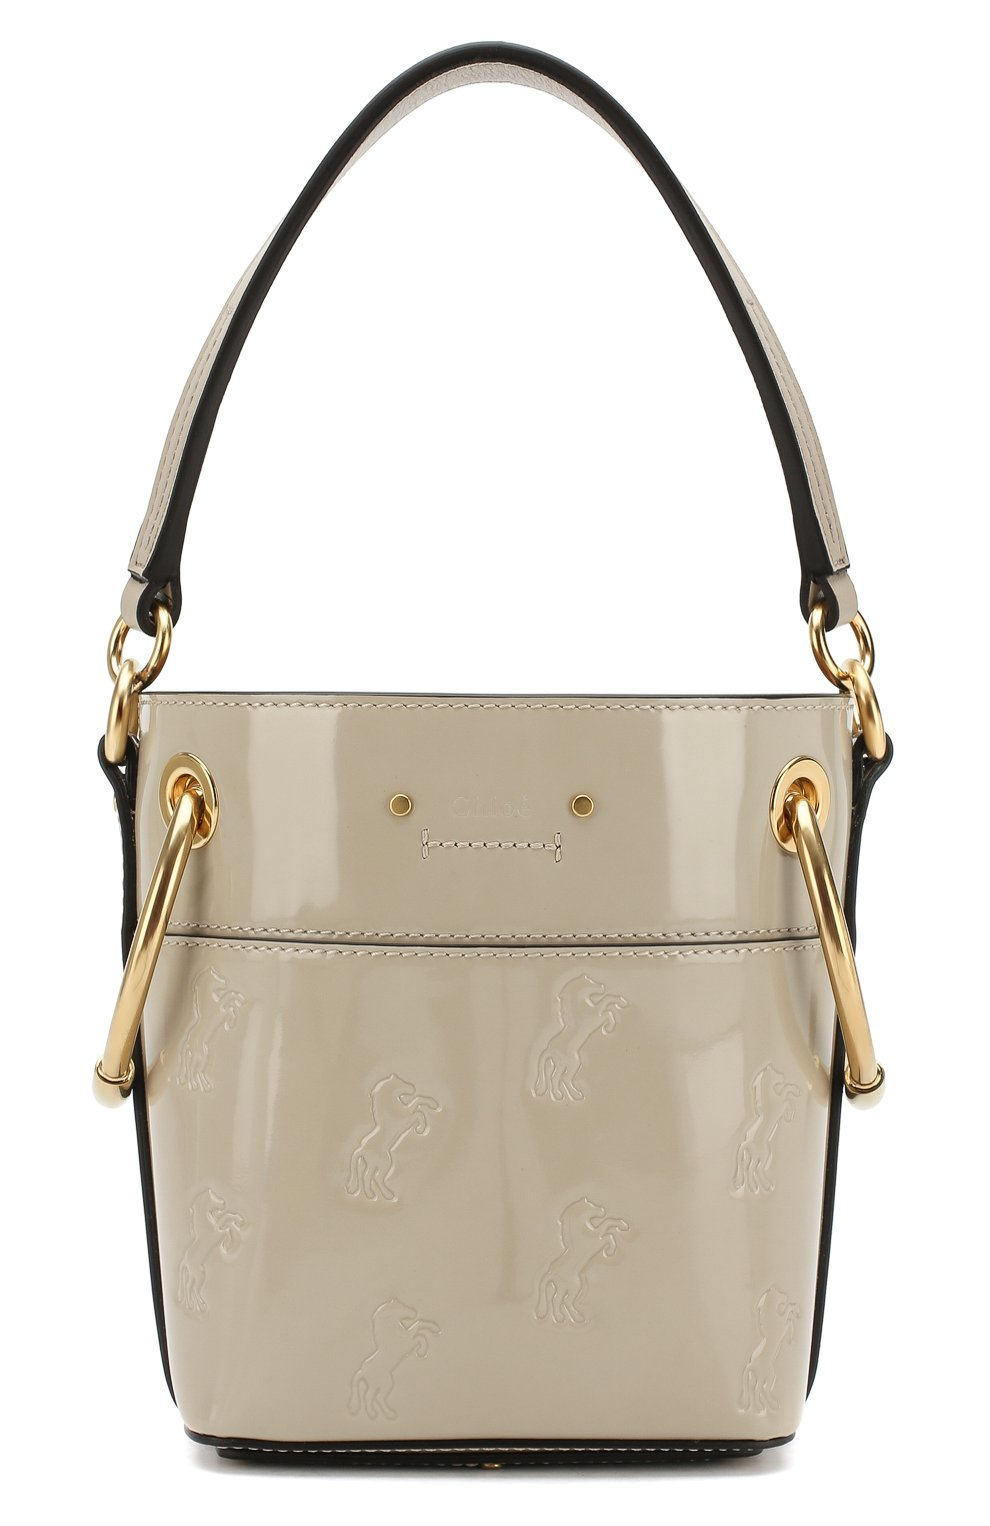 a2b8b90940e3 Женская сумка roy bucket mini CHLOÉ серая цвета — купить за 97550 ...